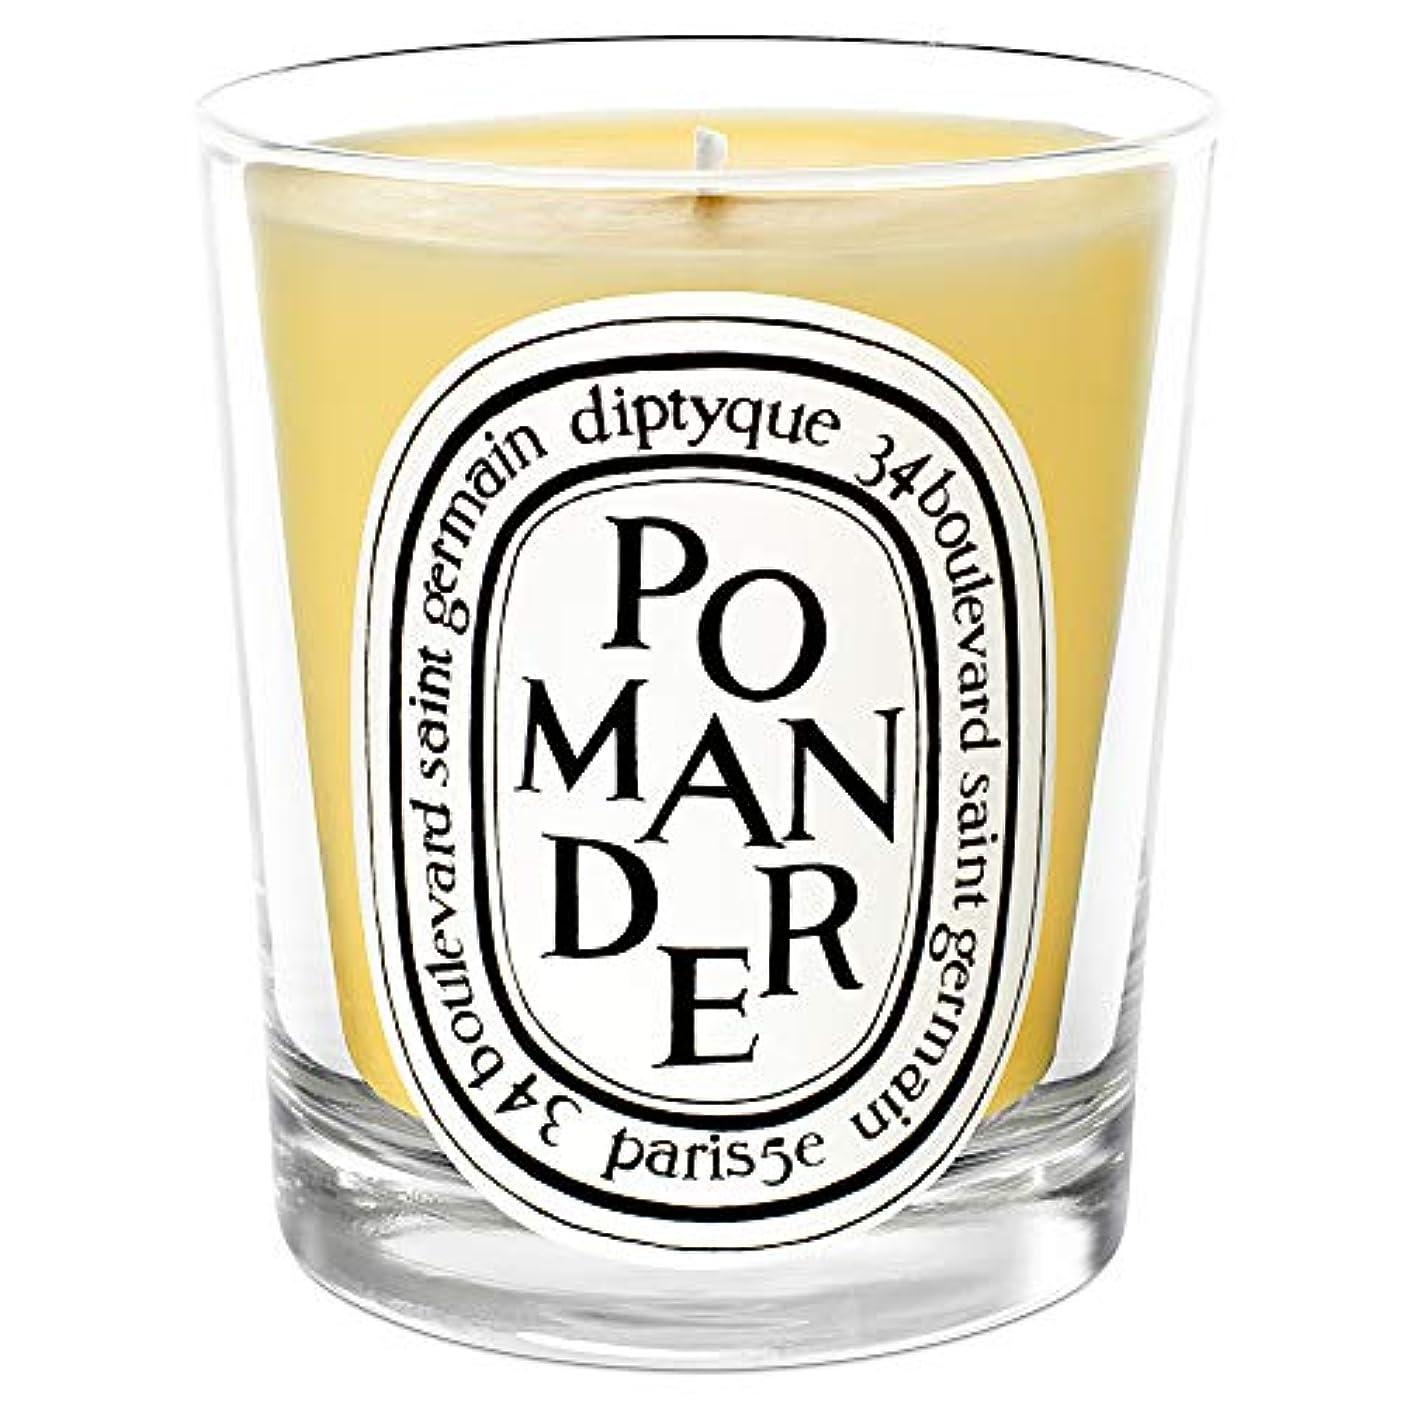 [Diptyque] DiptyqueのPomander香りのキャンドル190グラム - Diptyque Pomander Scented Candle 190g [並行輸入品]